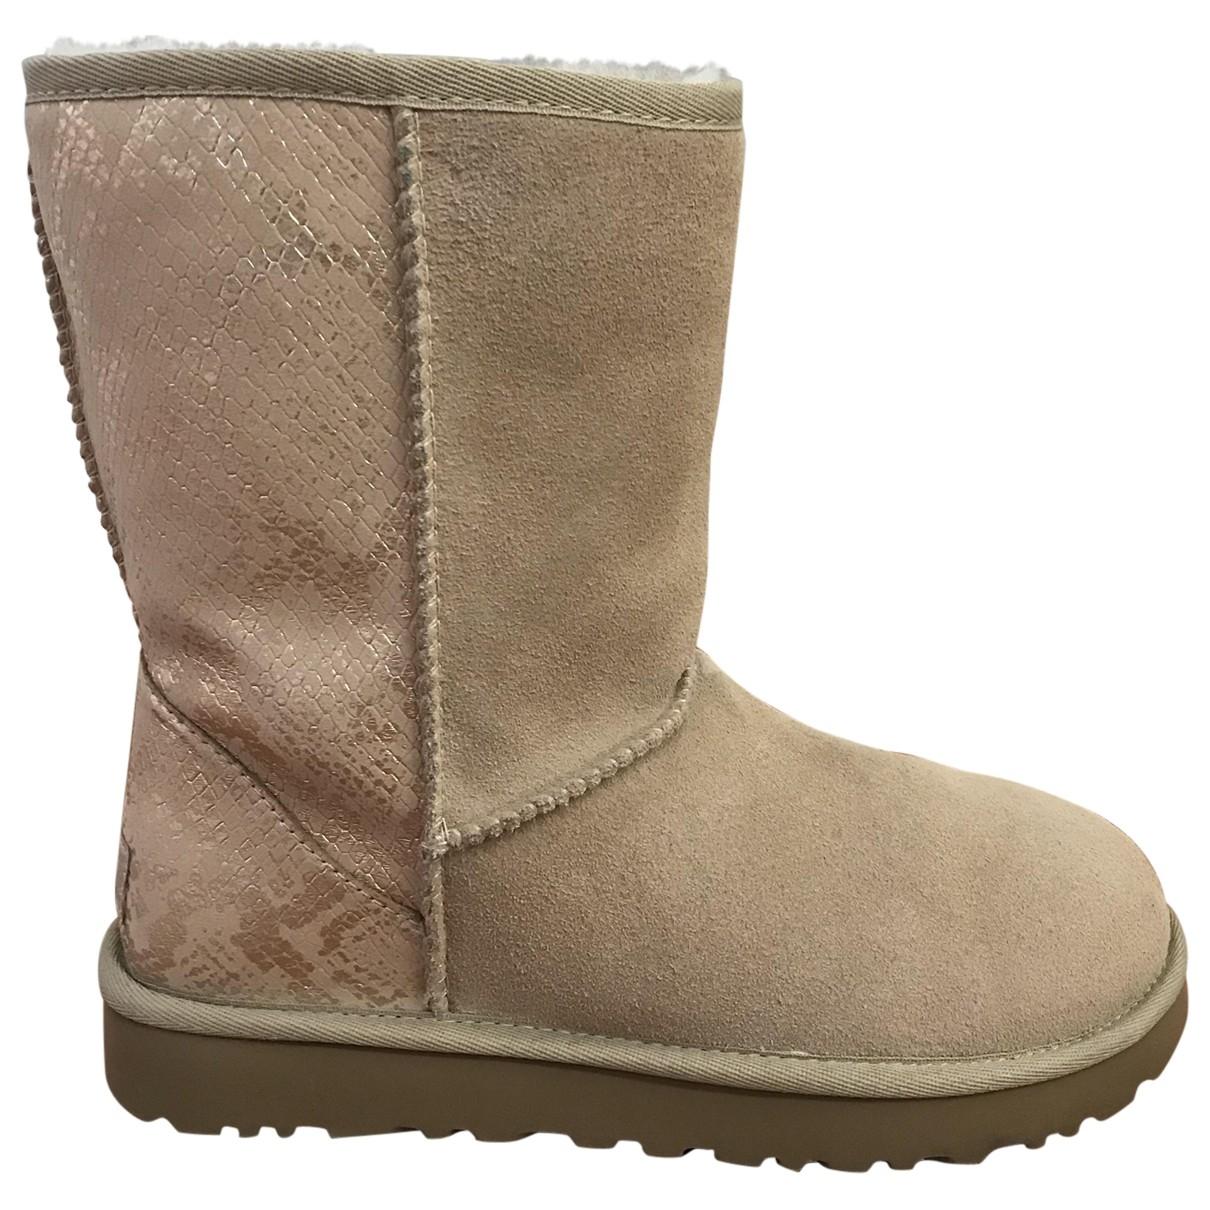 Ugg \N Beige Suede Boots for Women 38 EU